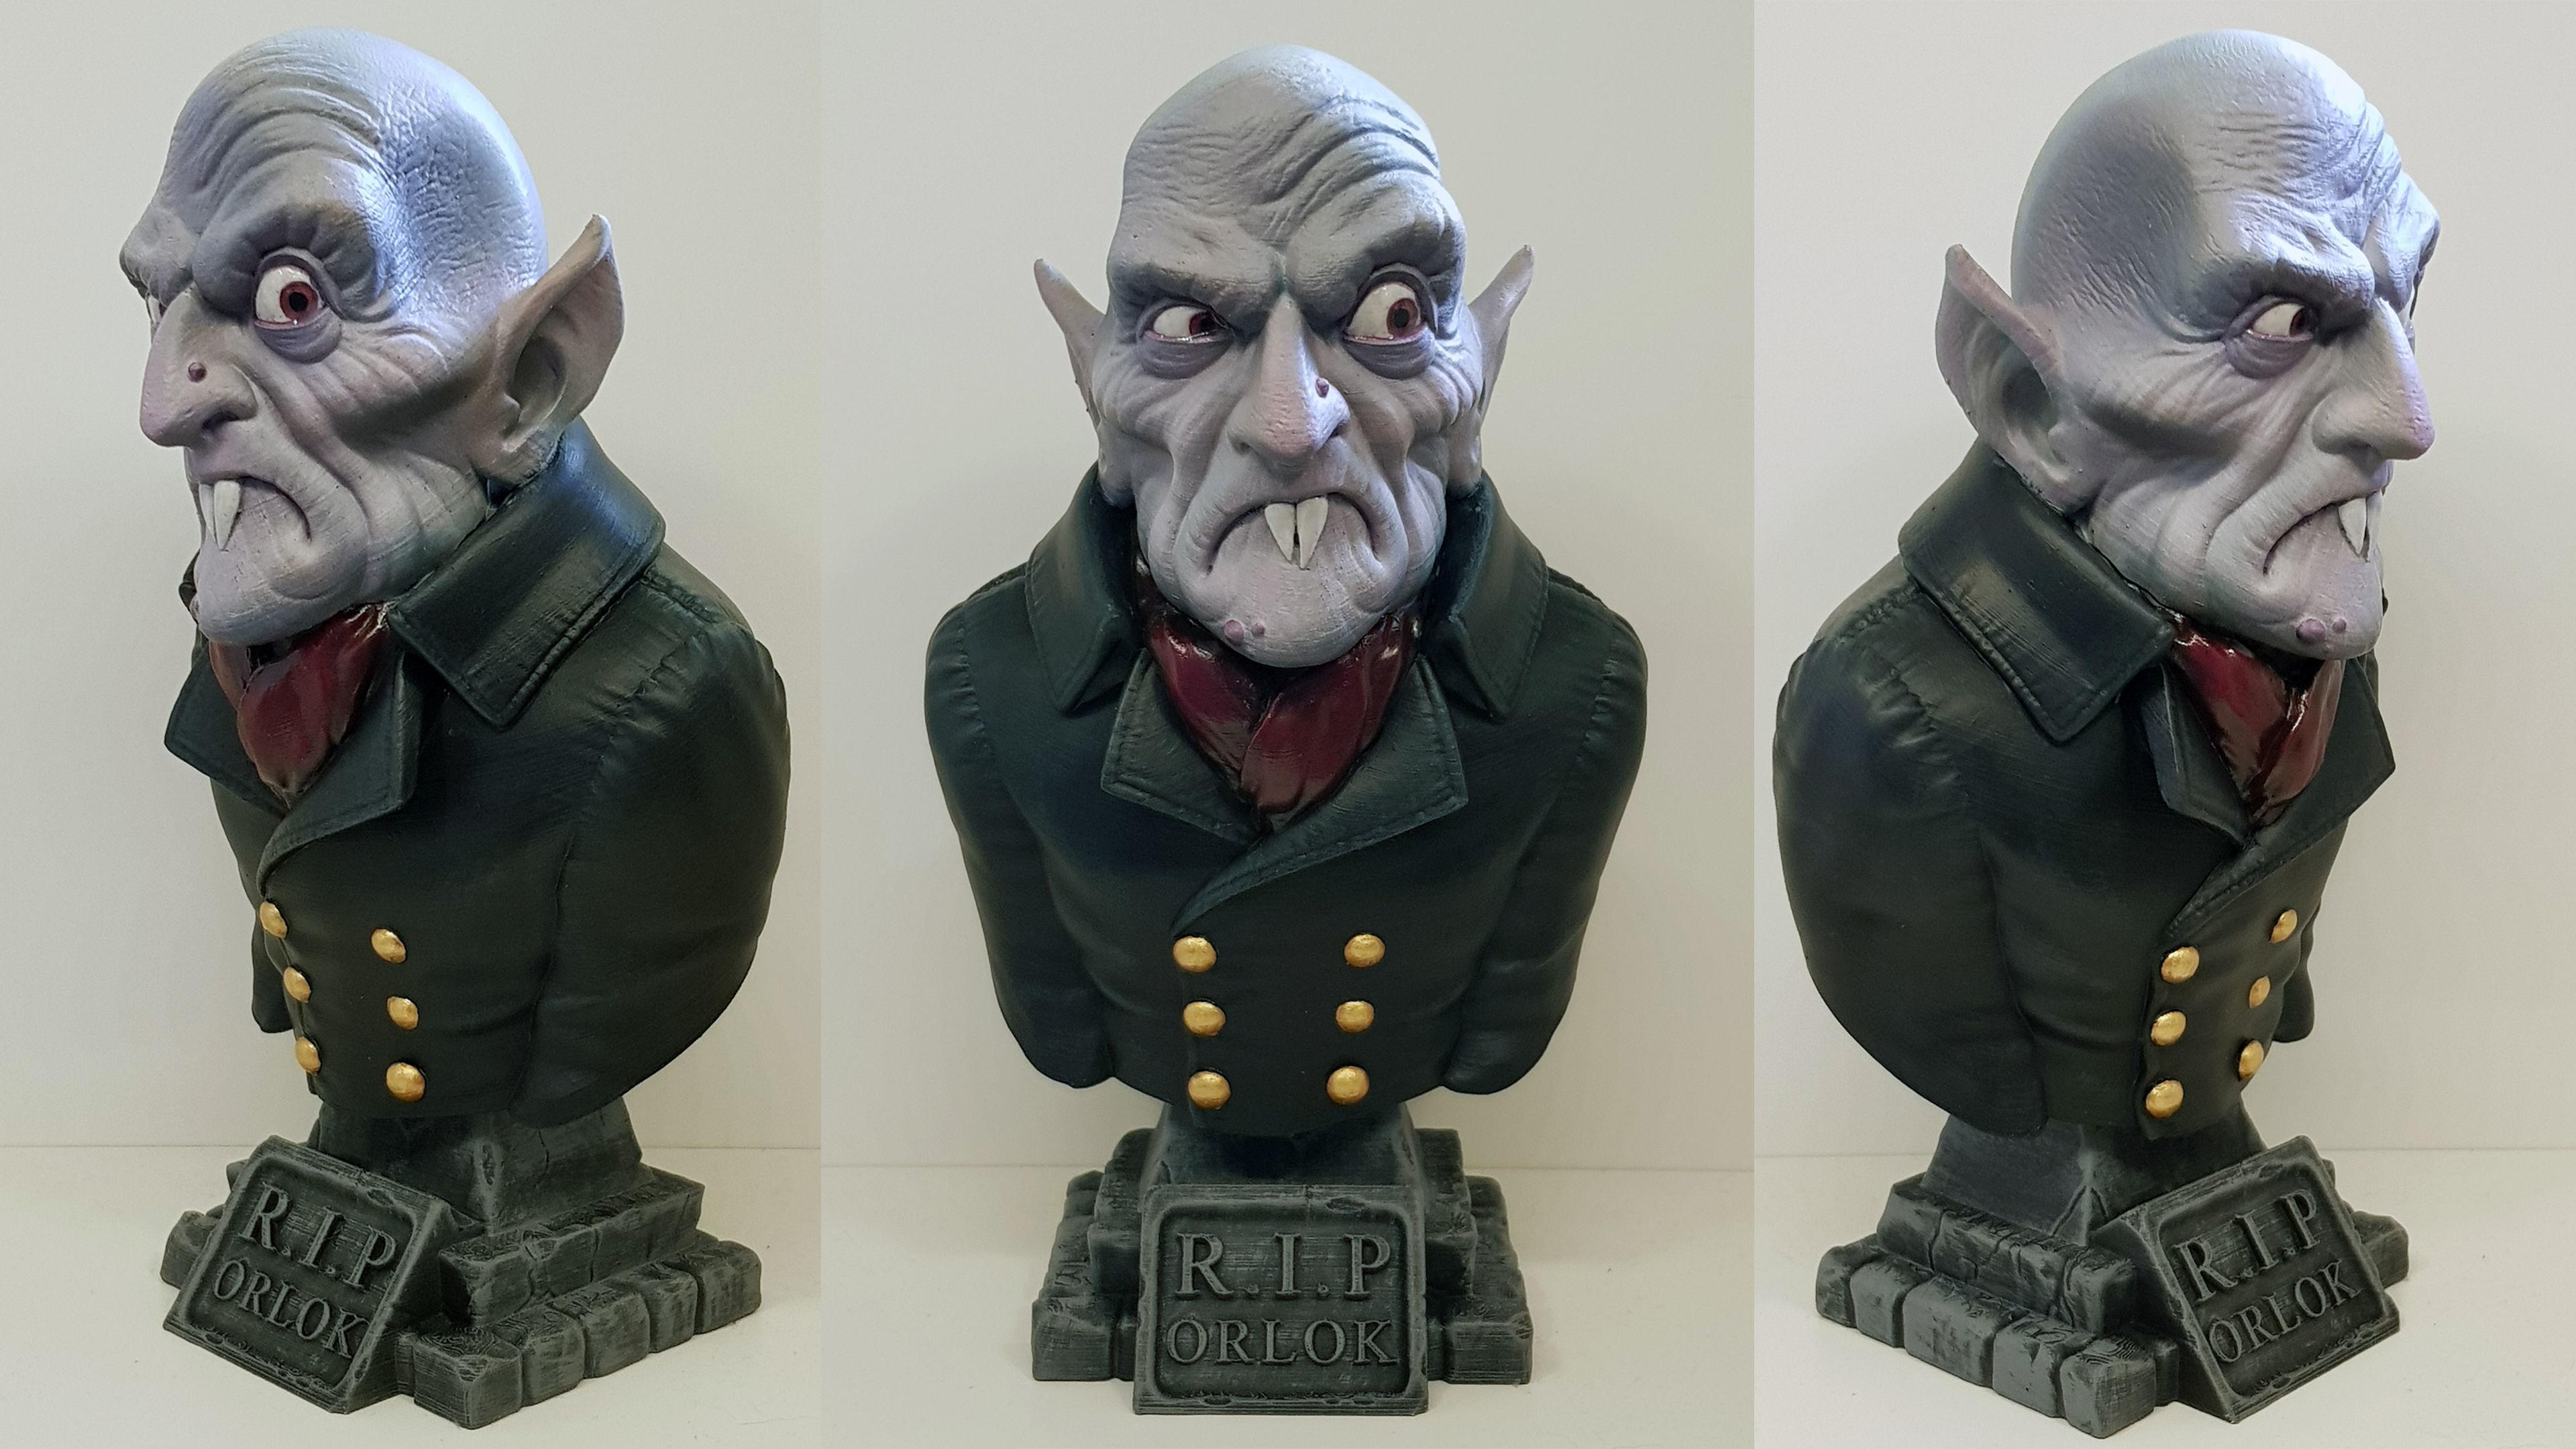 Count Orlok Bust